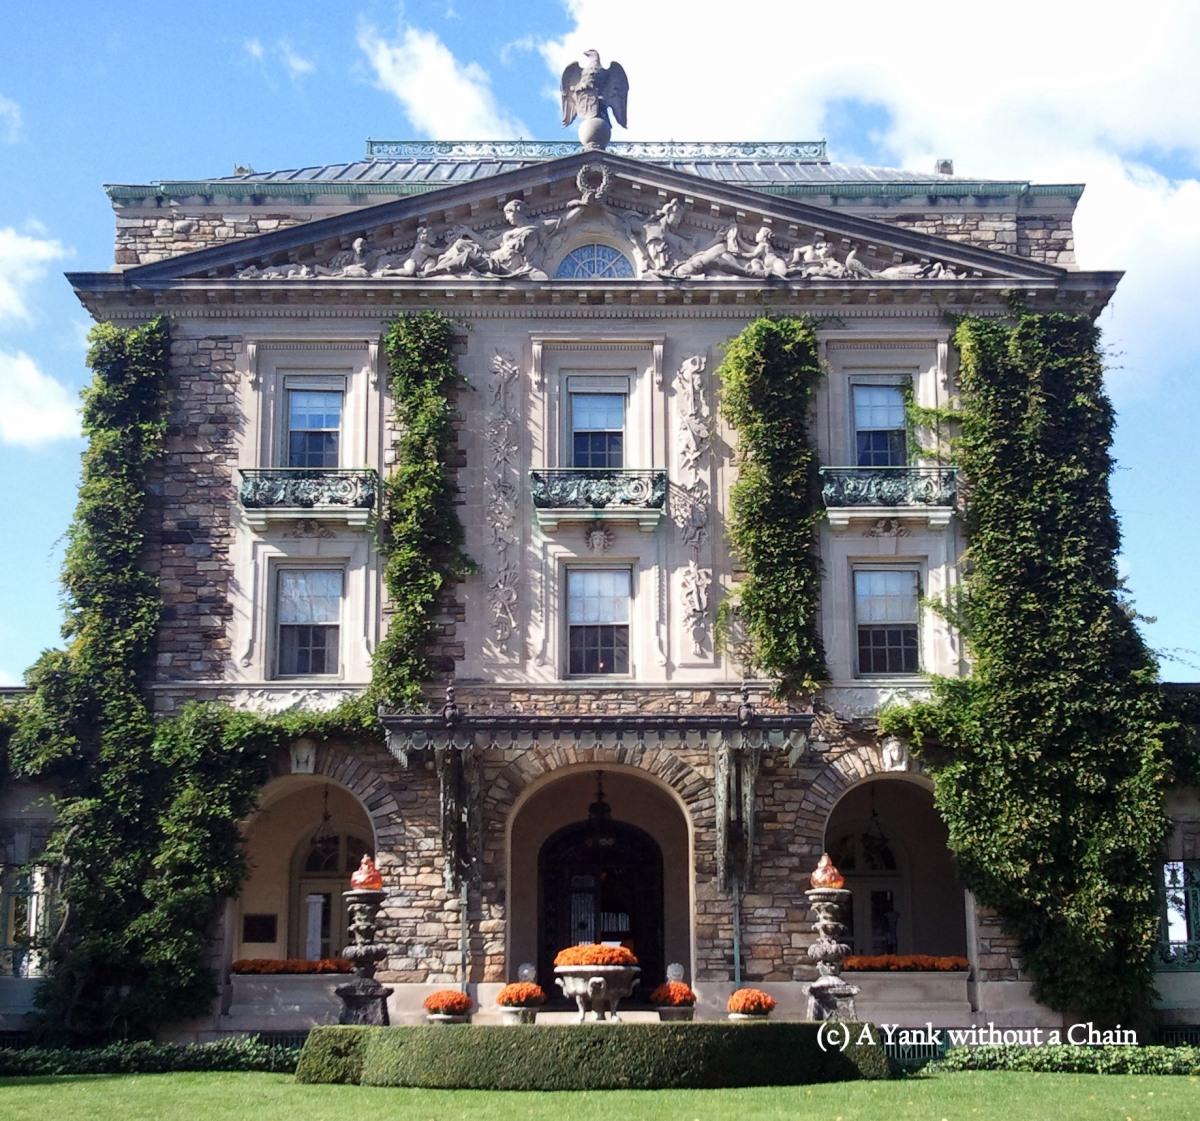 The main house of the Kykuit Rockefeller Estate